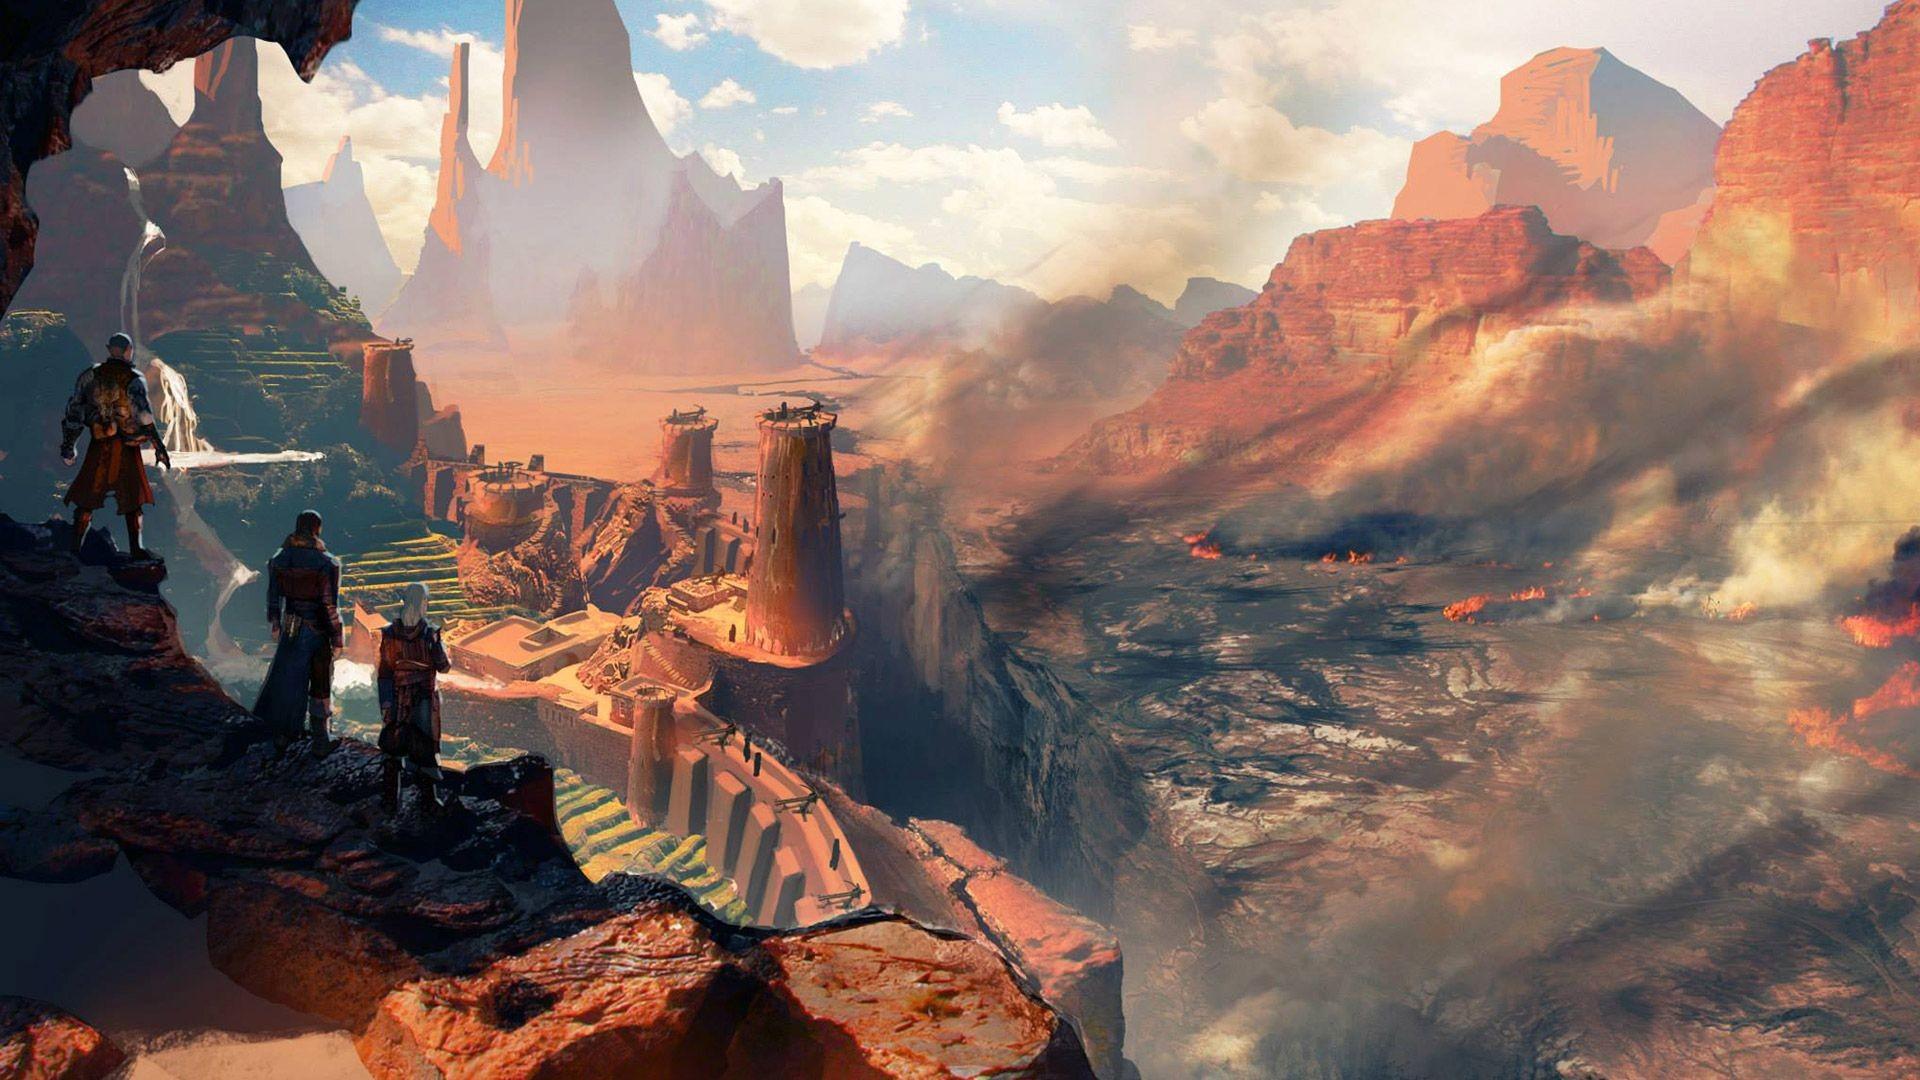 Dragon Age Inquisition Full HD Wallpaper